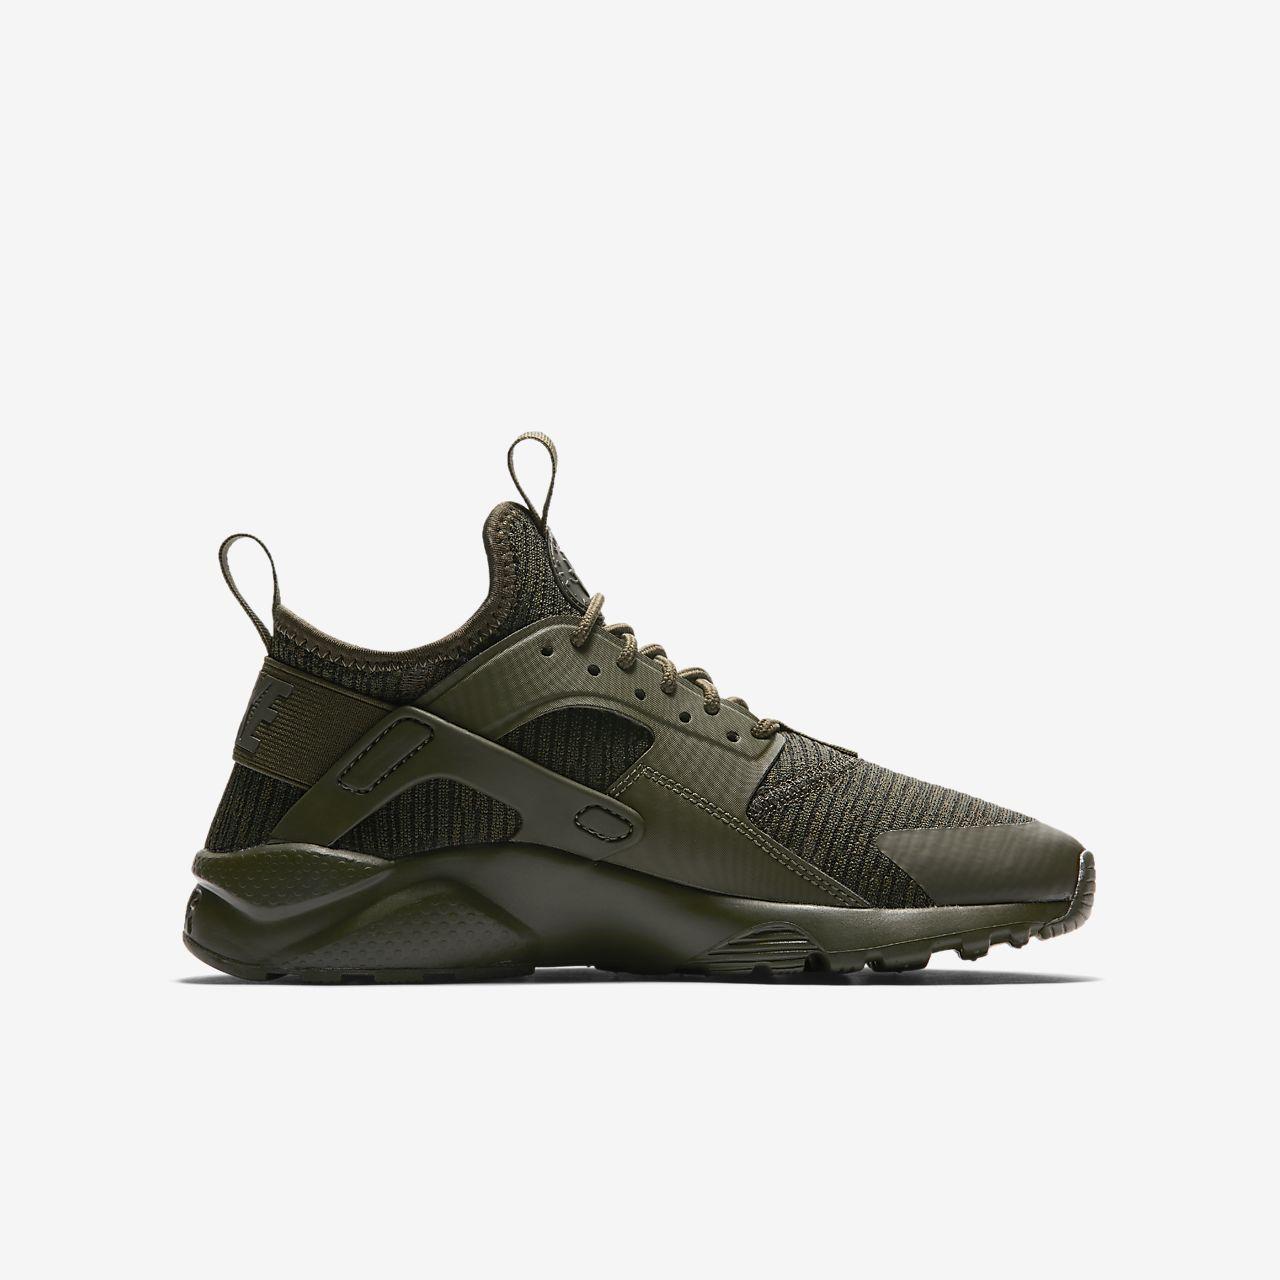 Chaussures  à élastique Nike Air Huarache Urbaines homme NycYC